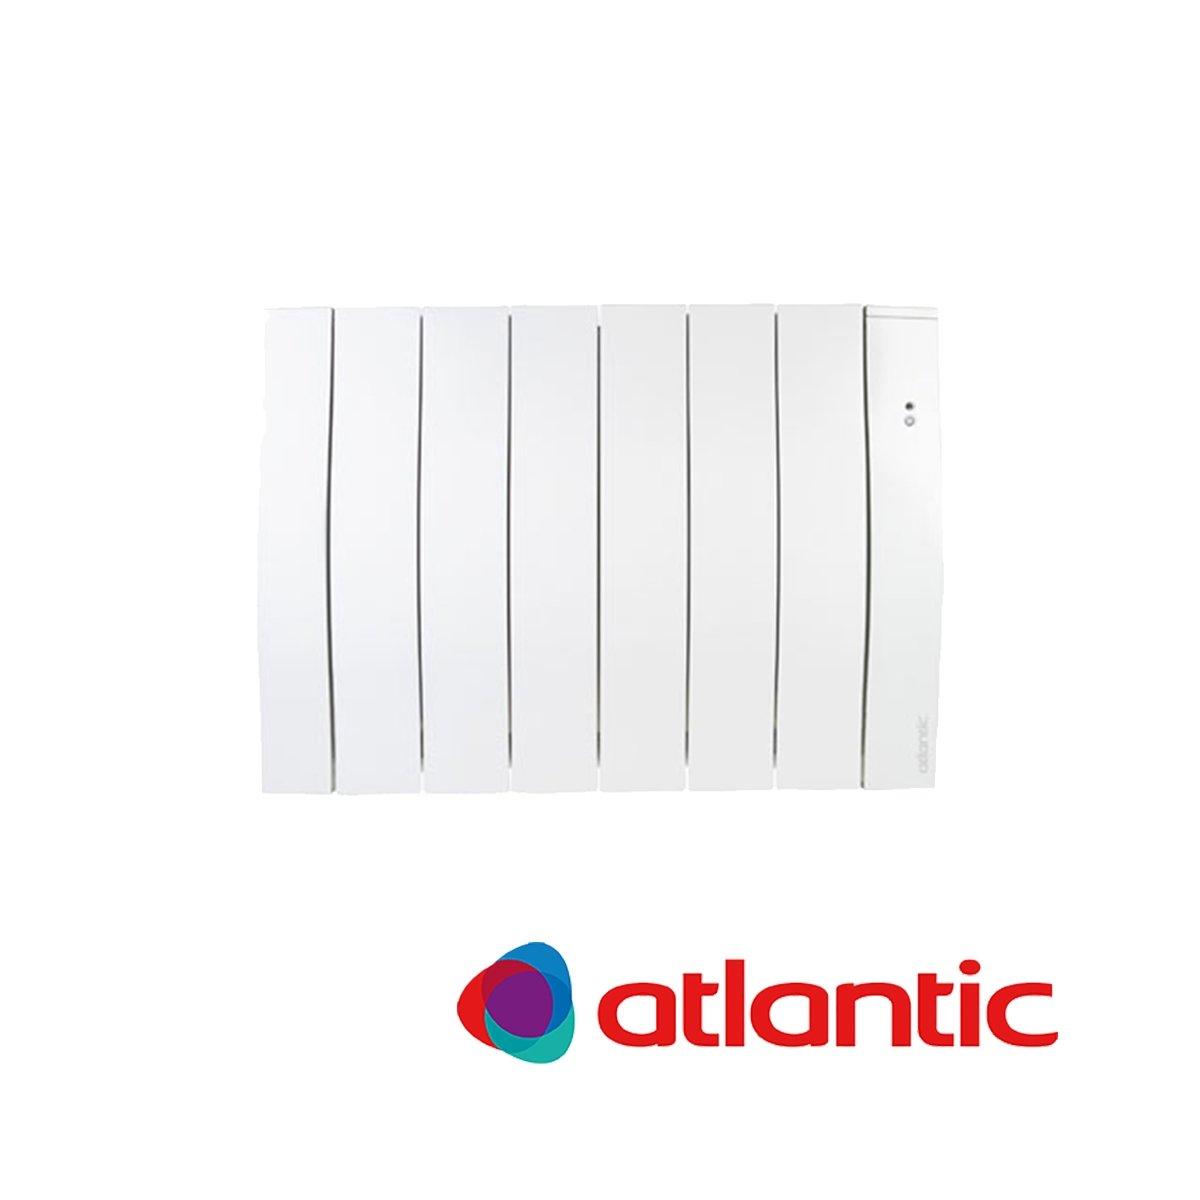 ATLANTIC - product - ATL-GALAPAGOS-PI-CONNECTE - Blanc, Horizontal, 750 W, new, 675,6: Amazon.es: Iluminación